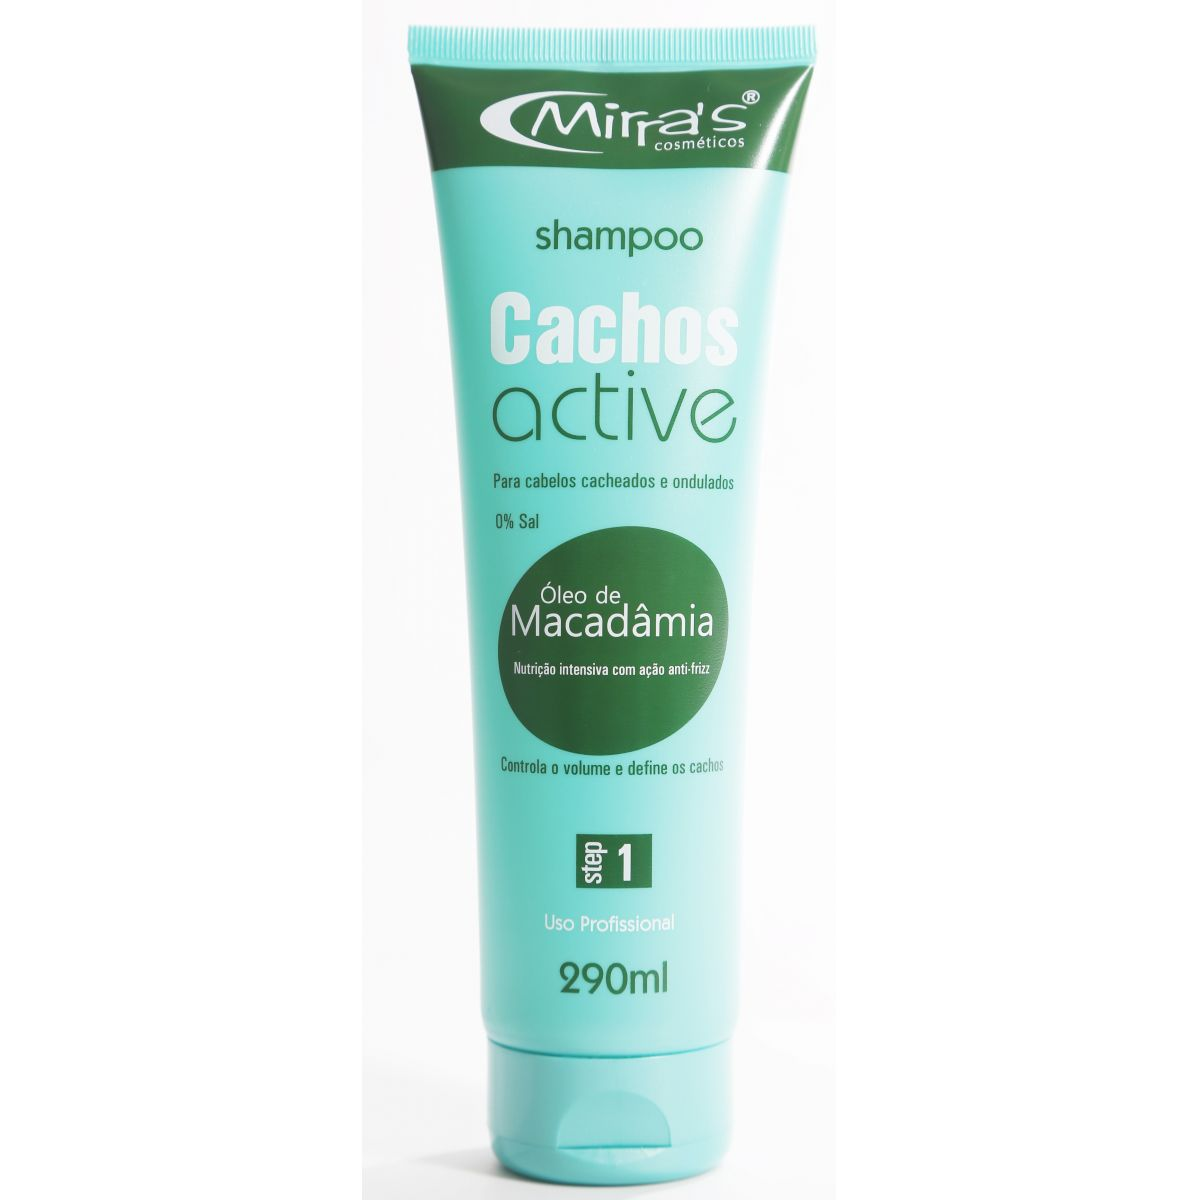 Shampoo Cachos Active Sem Sal Cabelos Ondulados 290ml - Mirra´s